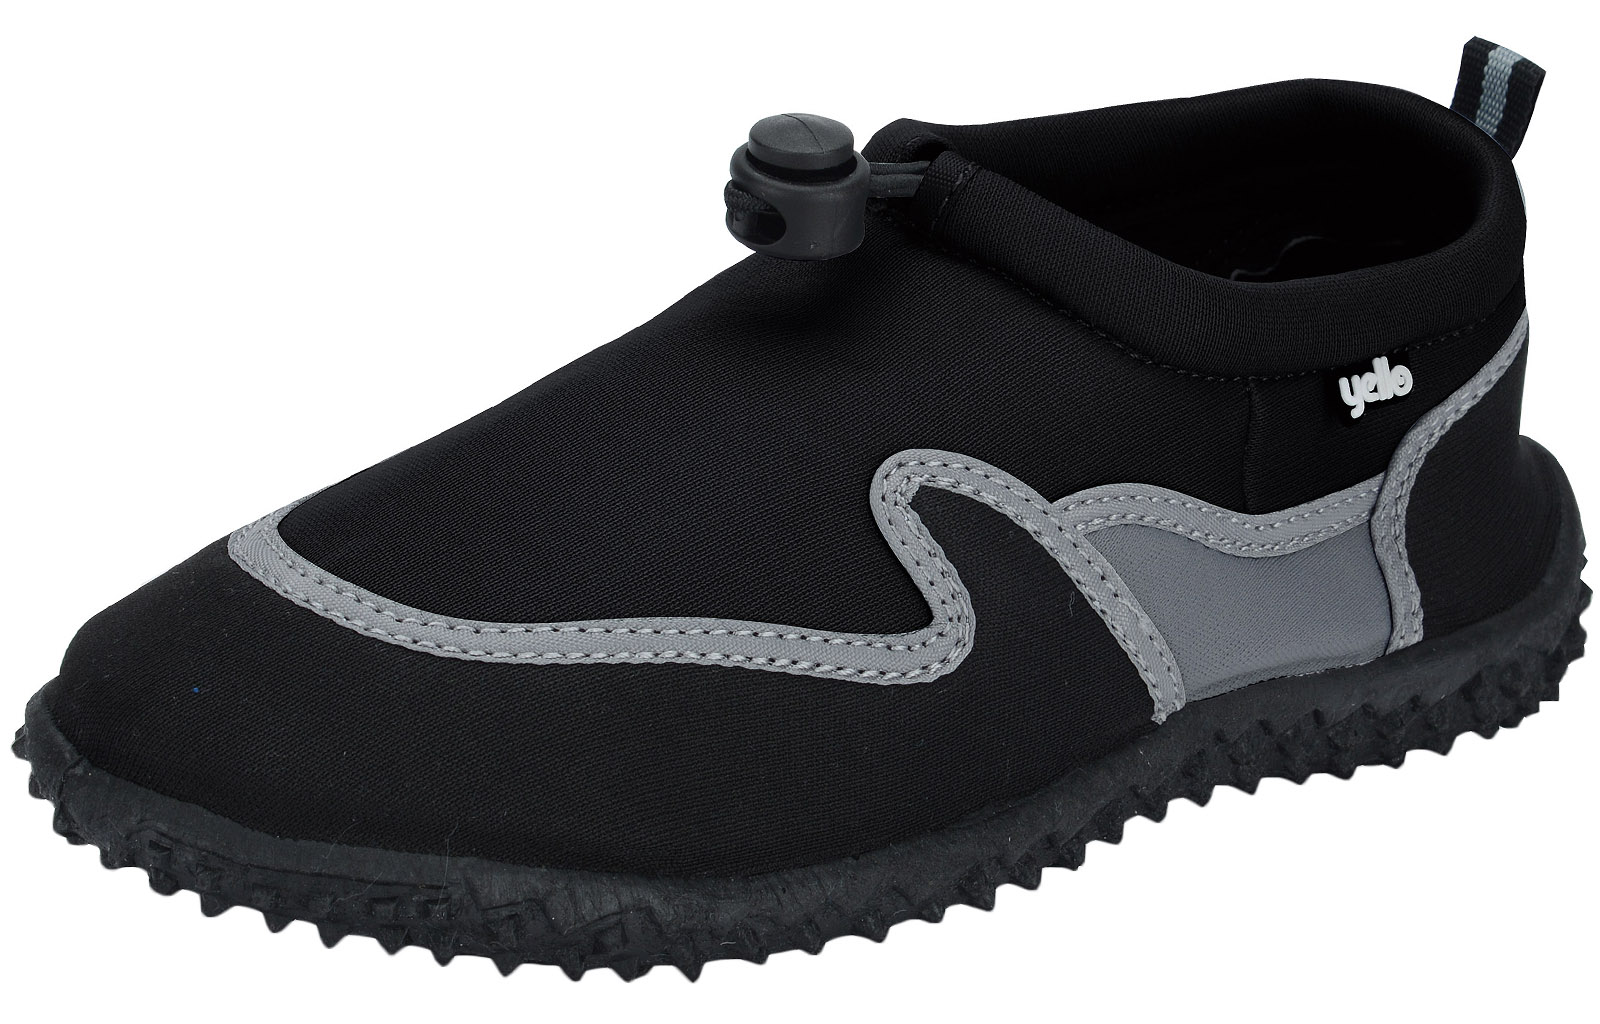 b0da39e94d19 Mens Boys Aqua Socks Beach Water Shoes Scuba Swim Surf Wetsuit Non ...